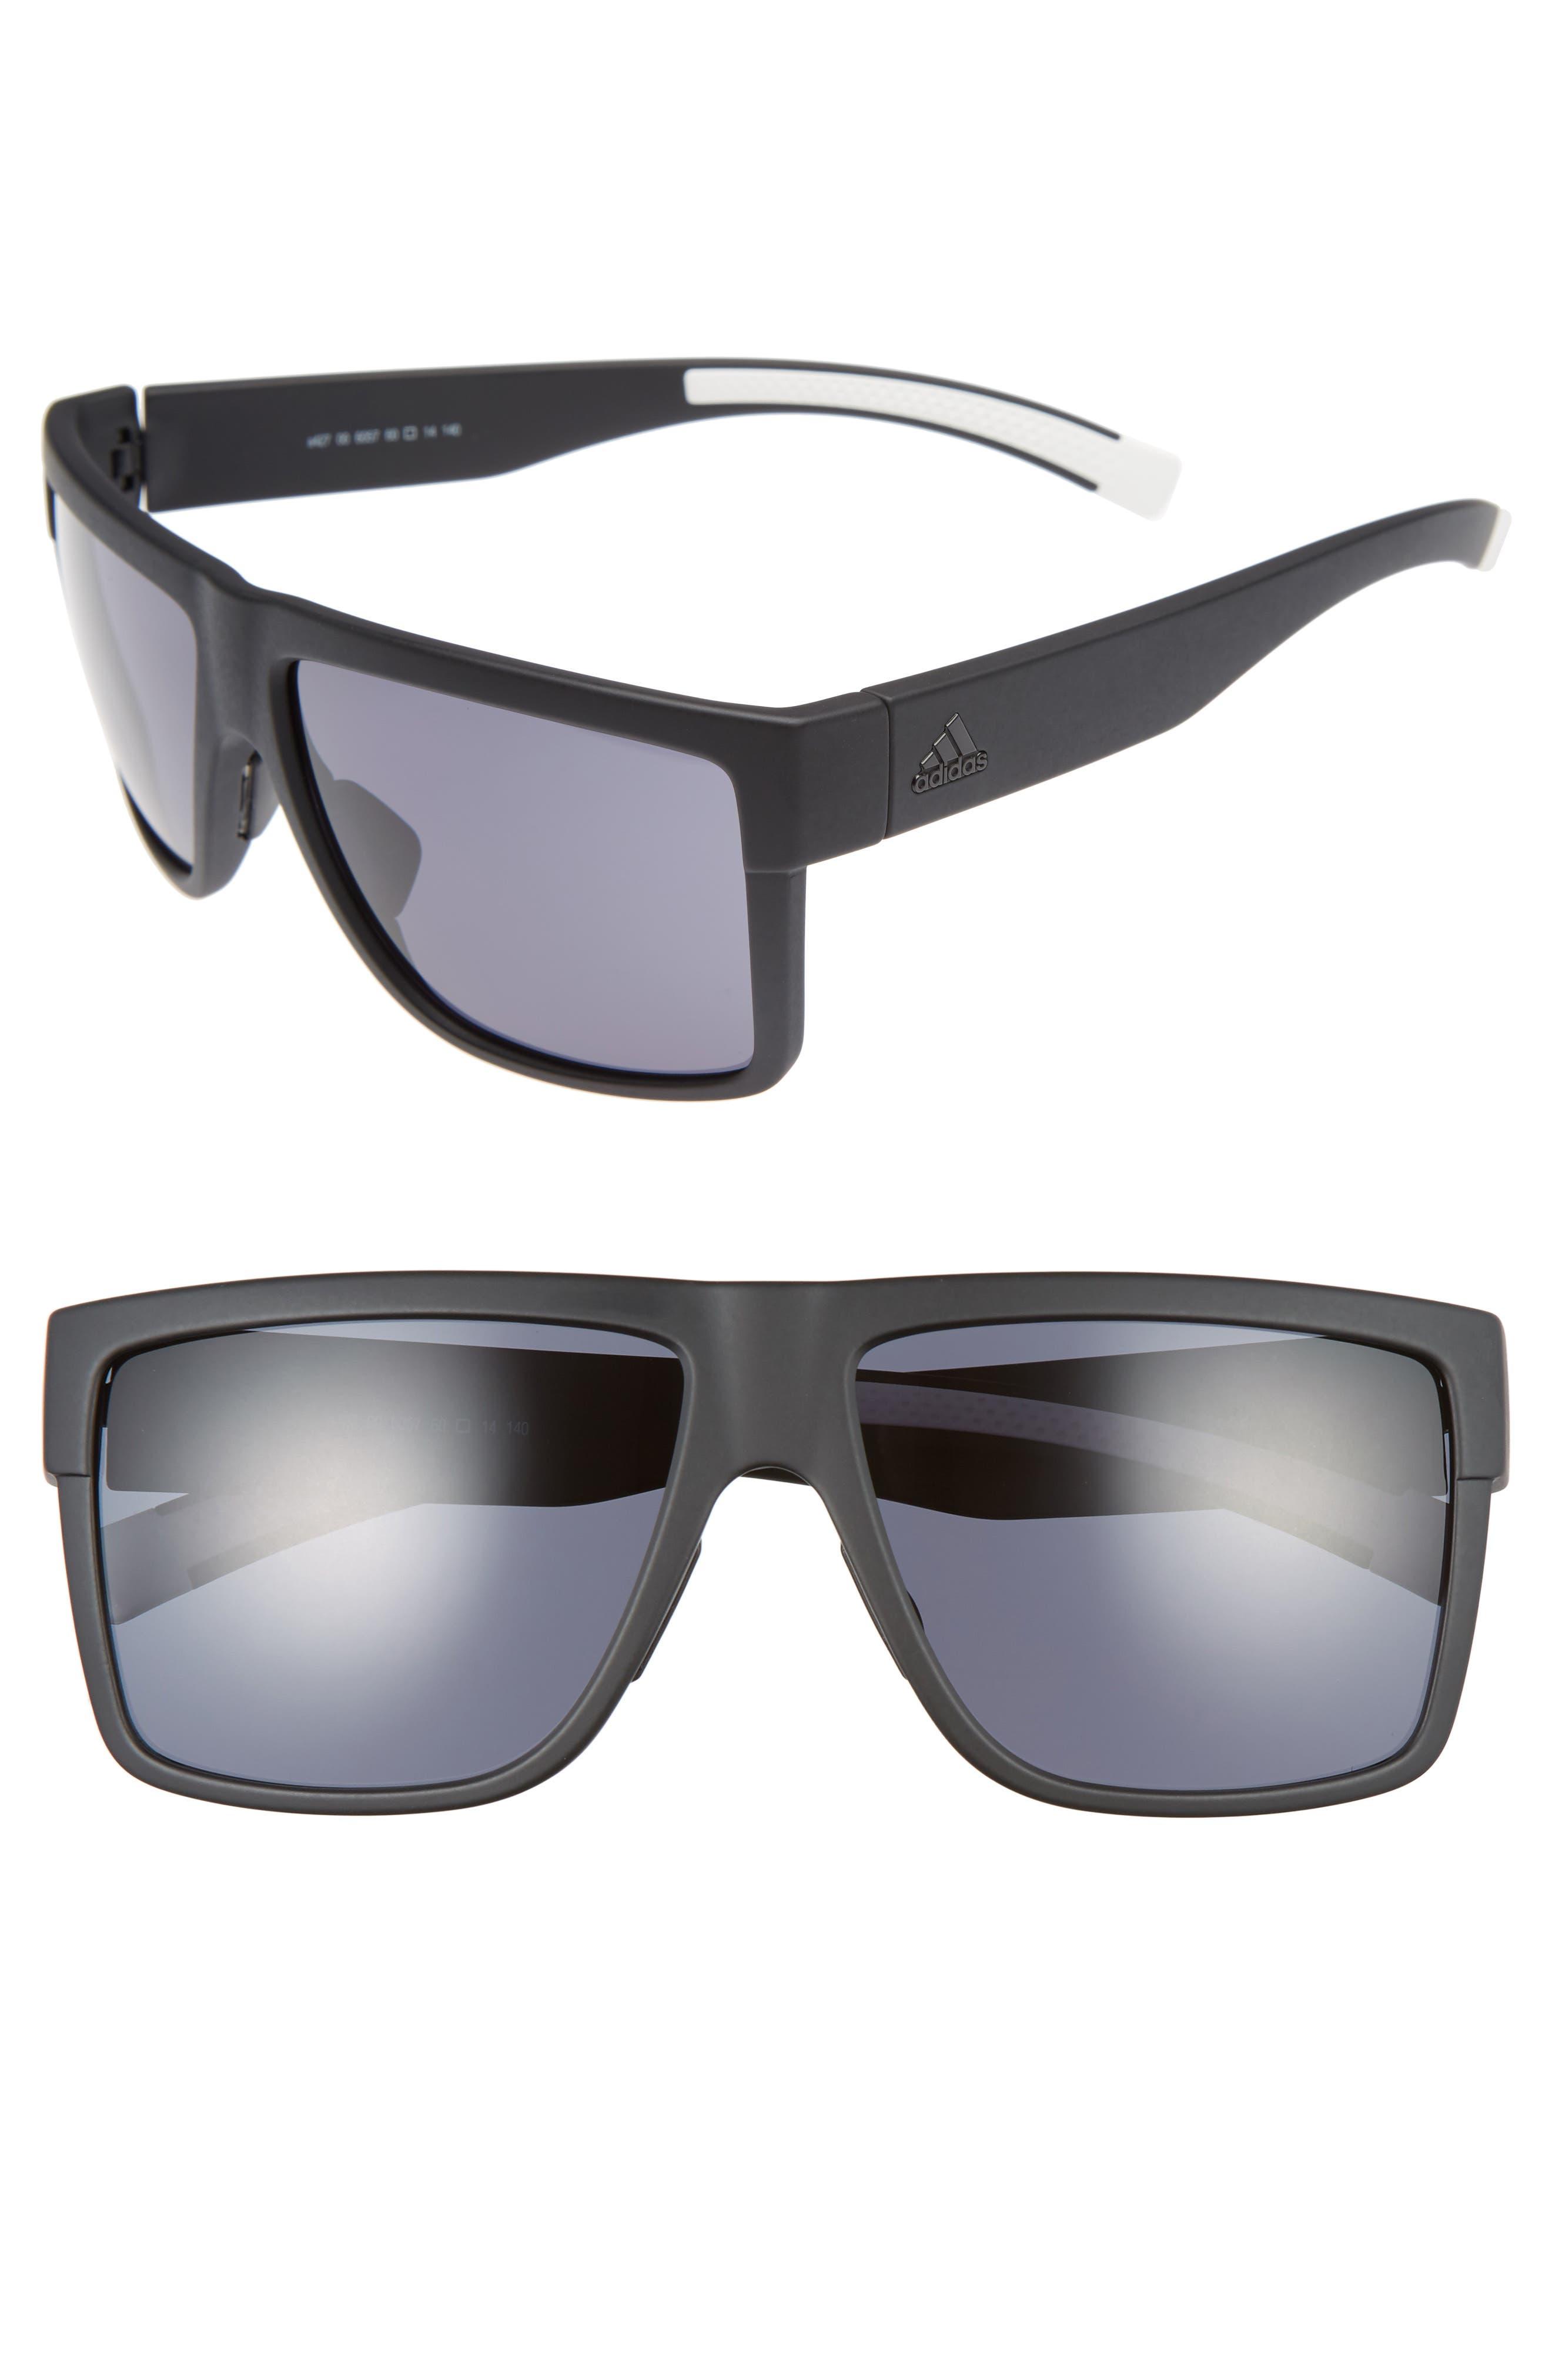 3Matic 60mm Sunglasses,                         Main,                         color, BLACK MATTE/ GREY